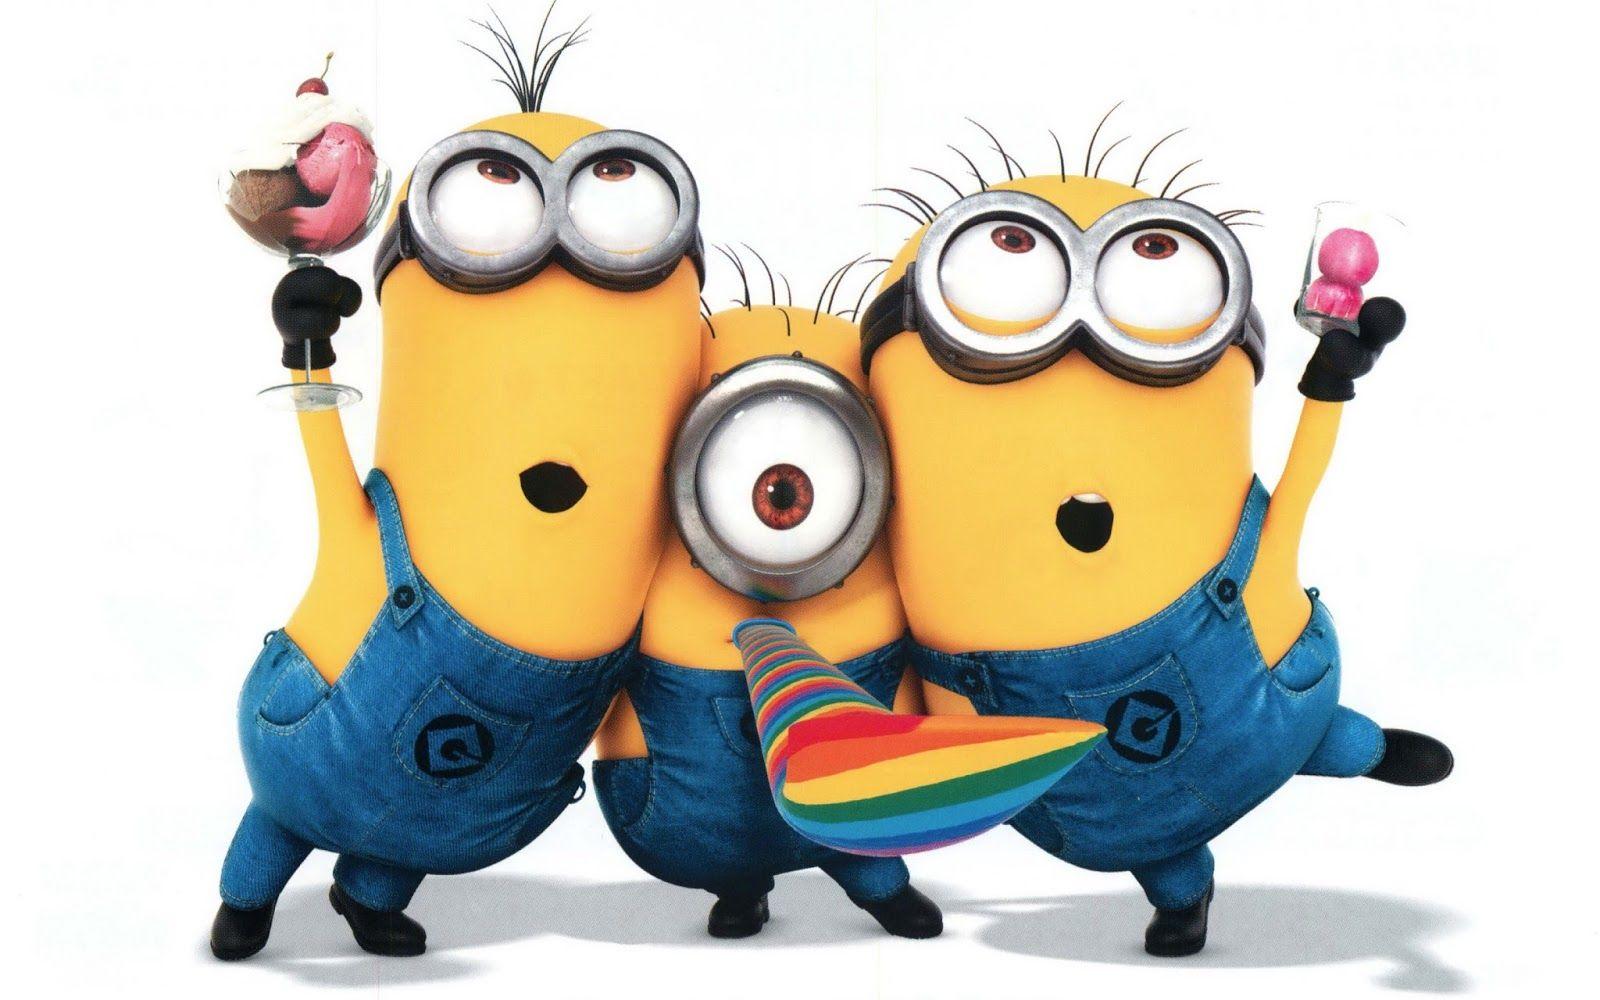 13 Mewarnai Gambar The Minions Bonikids Coloring Page Cute Minions Minions Happy Minions